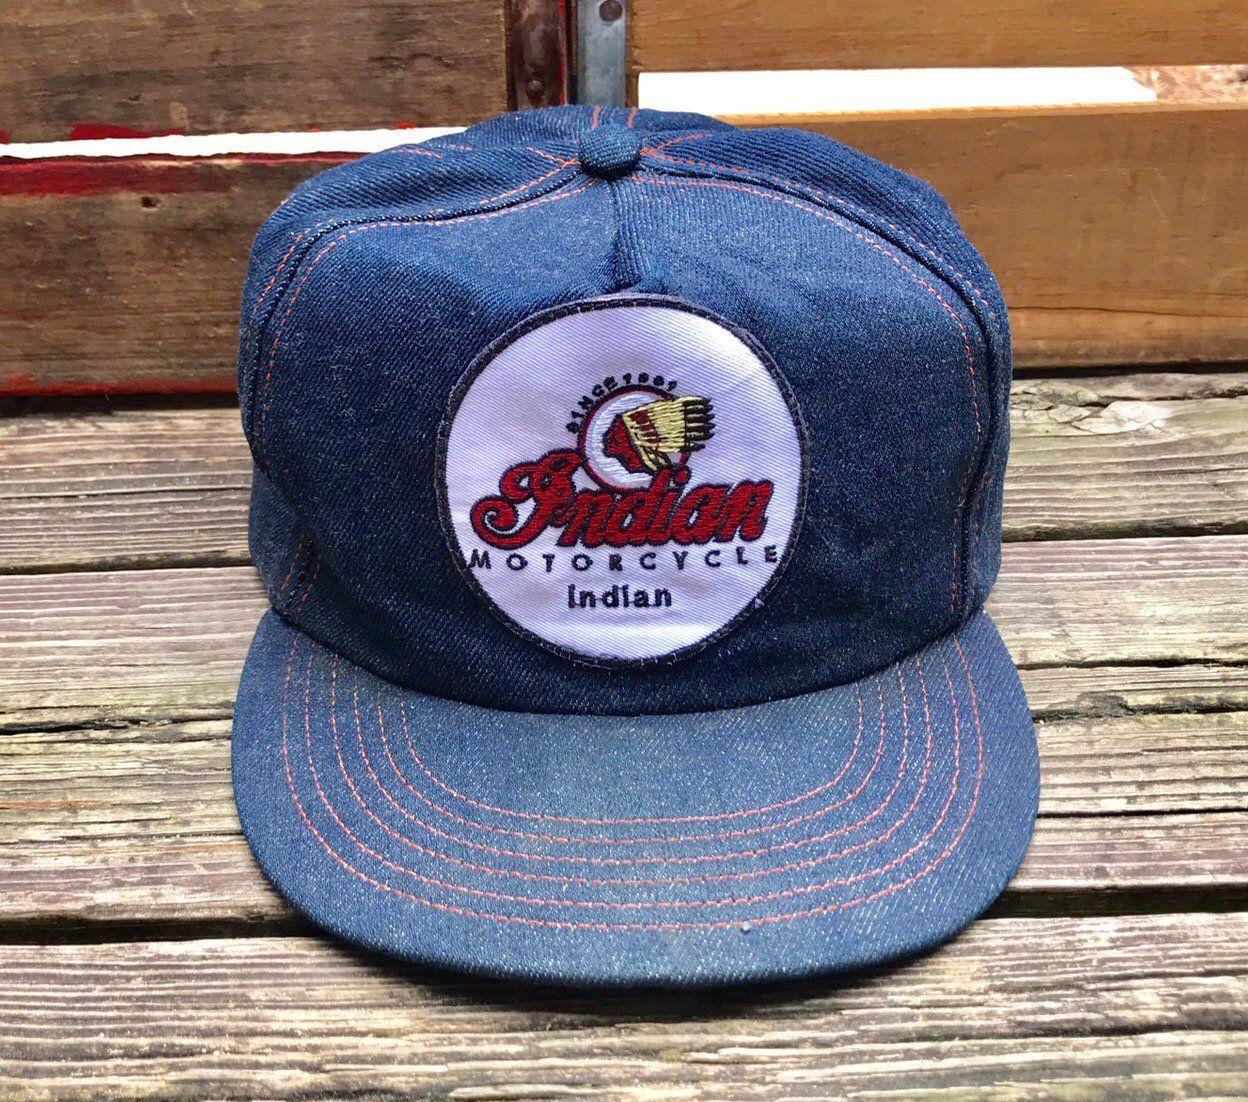 All Cotton Baseball Cap Indian-Motorcycles-logp Snapback Vintage Hat